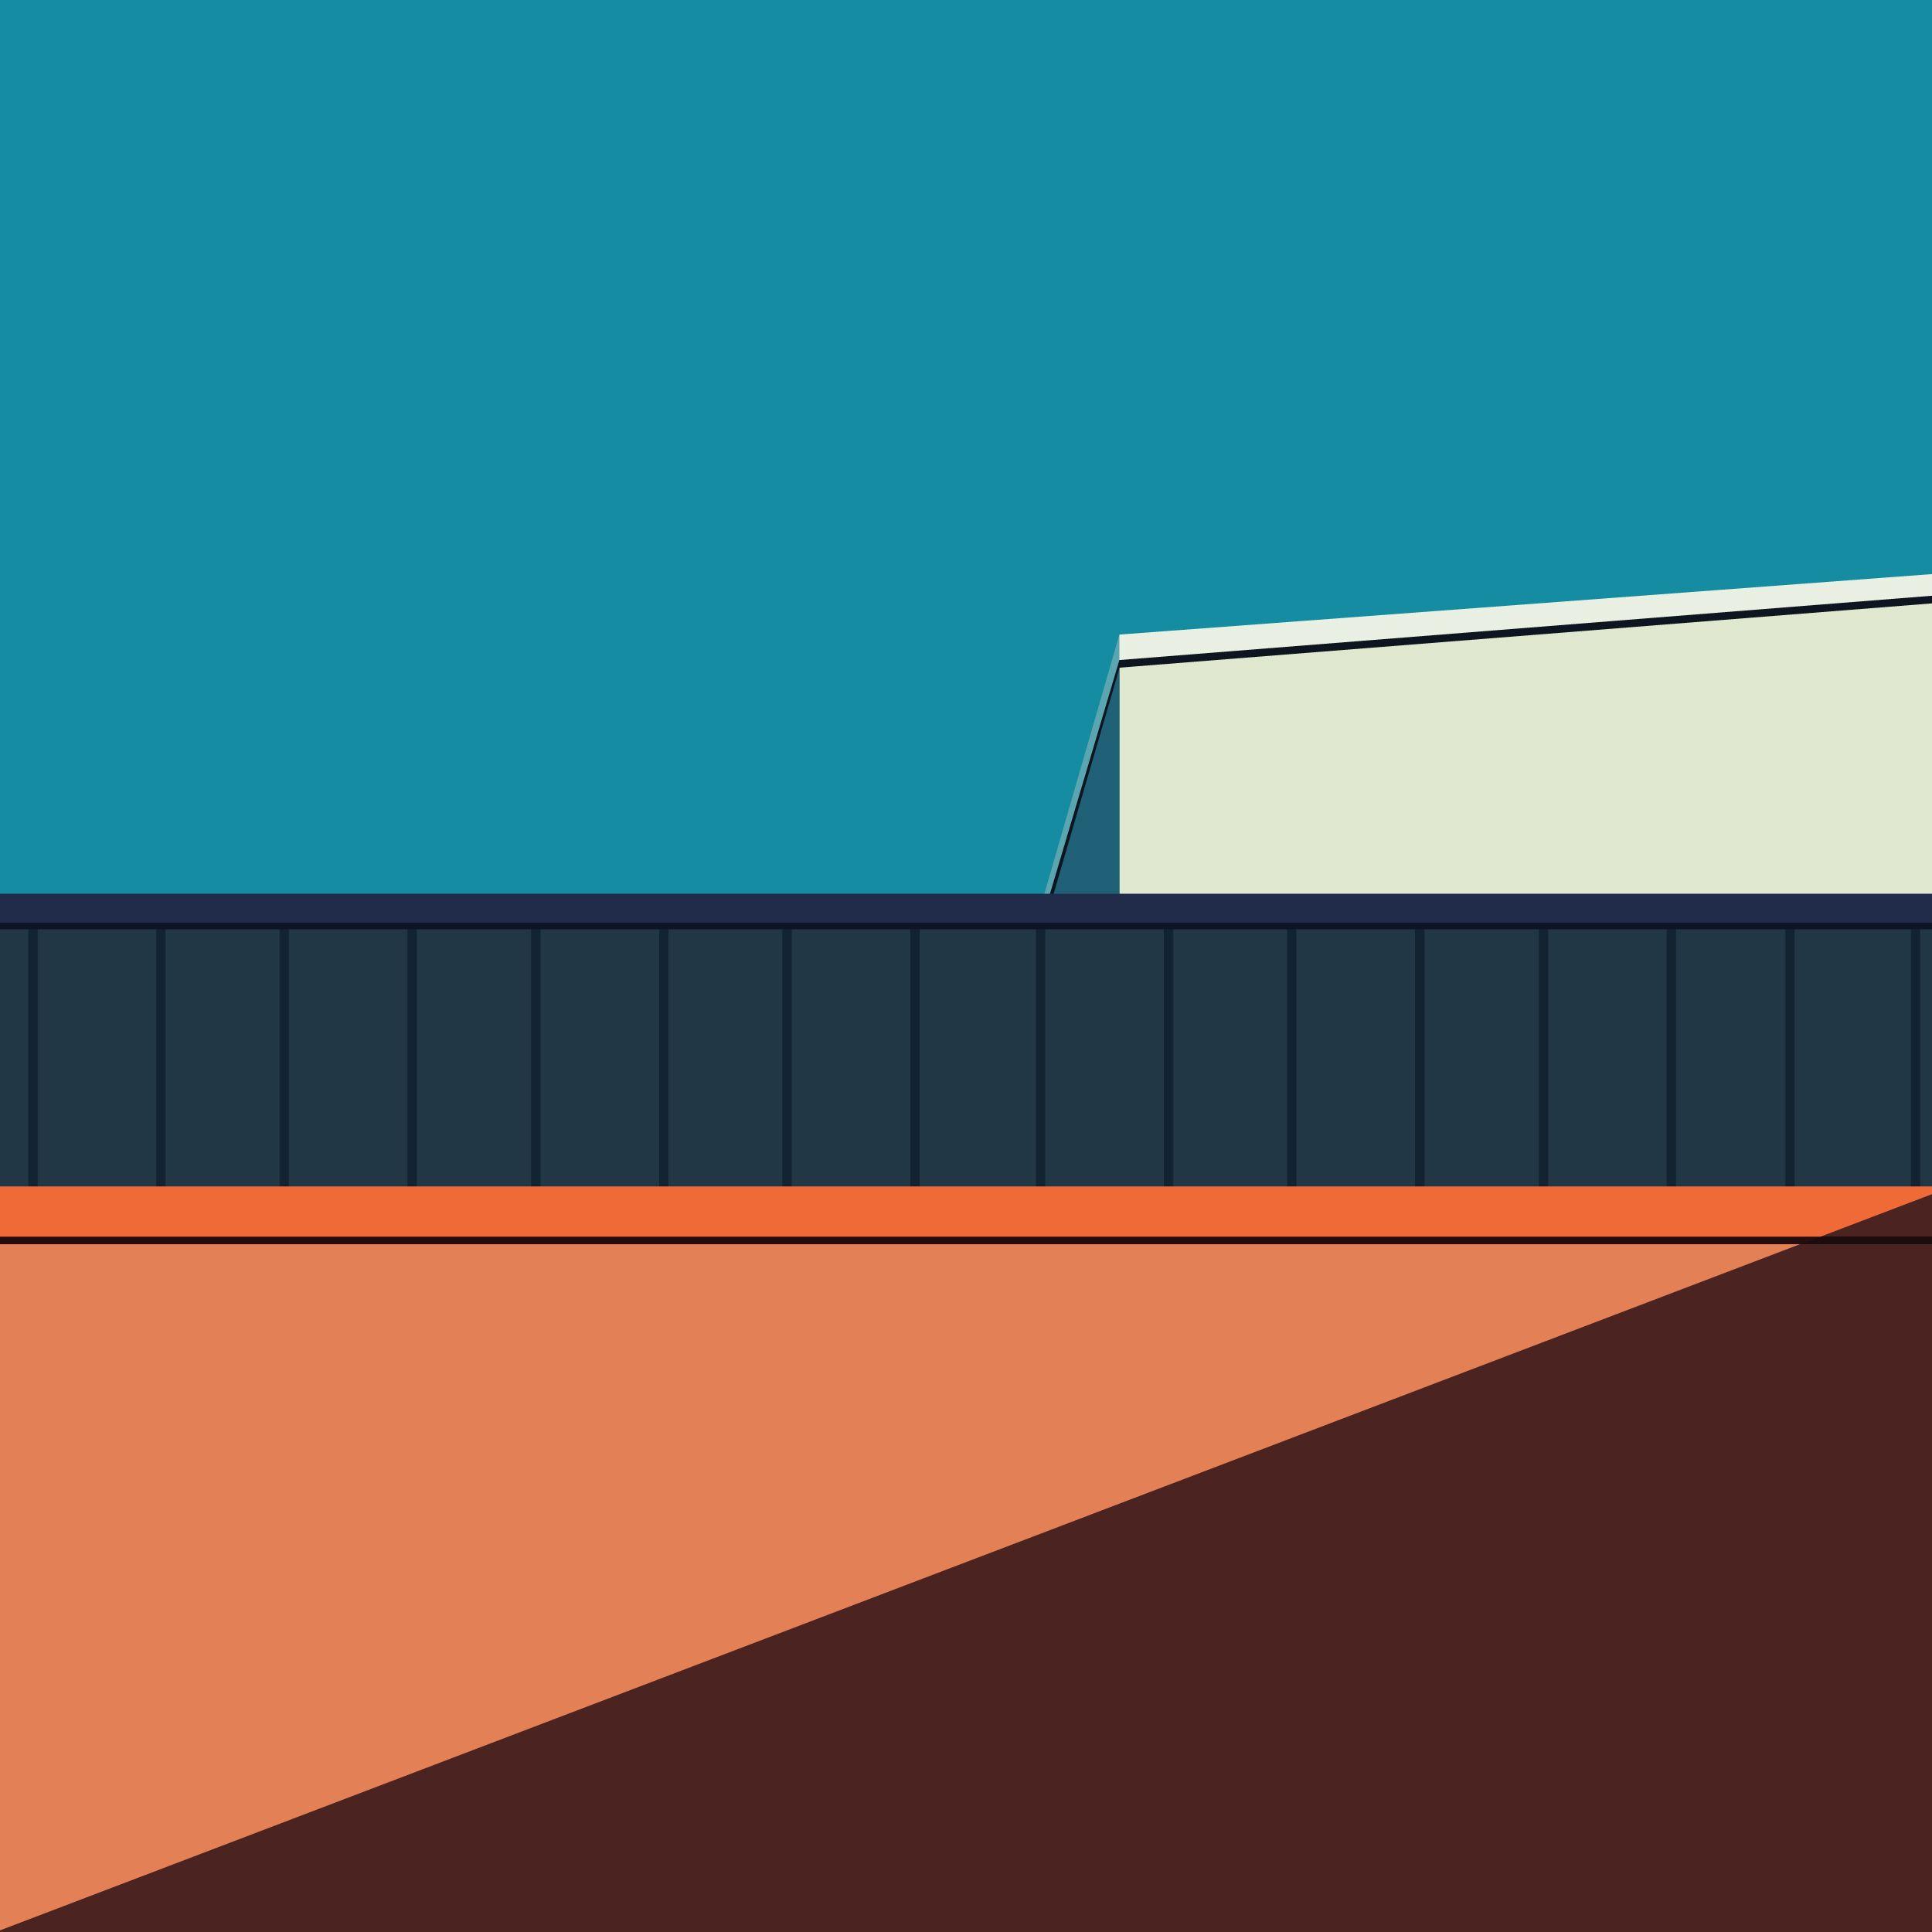 Colorful Minimalist Design: Minimalist Building. #building #minimalism #design